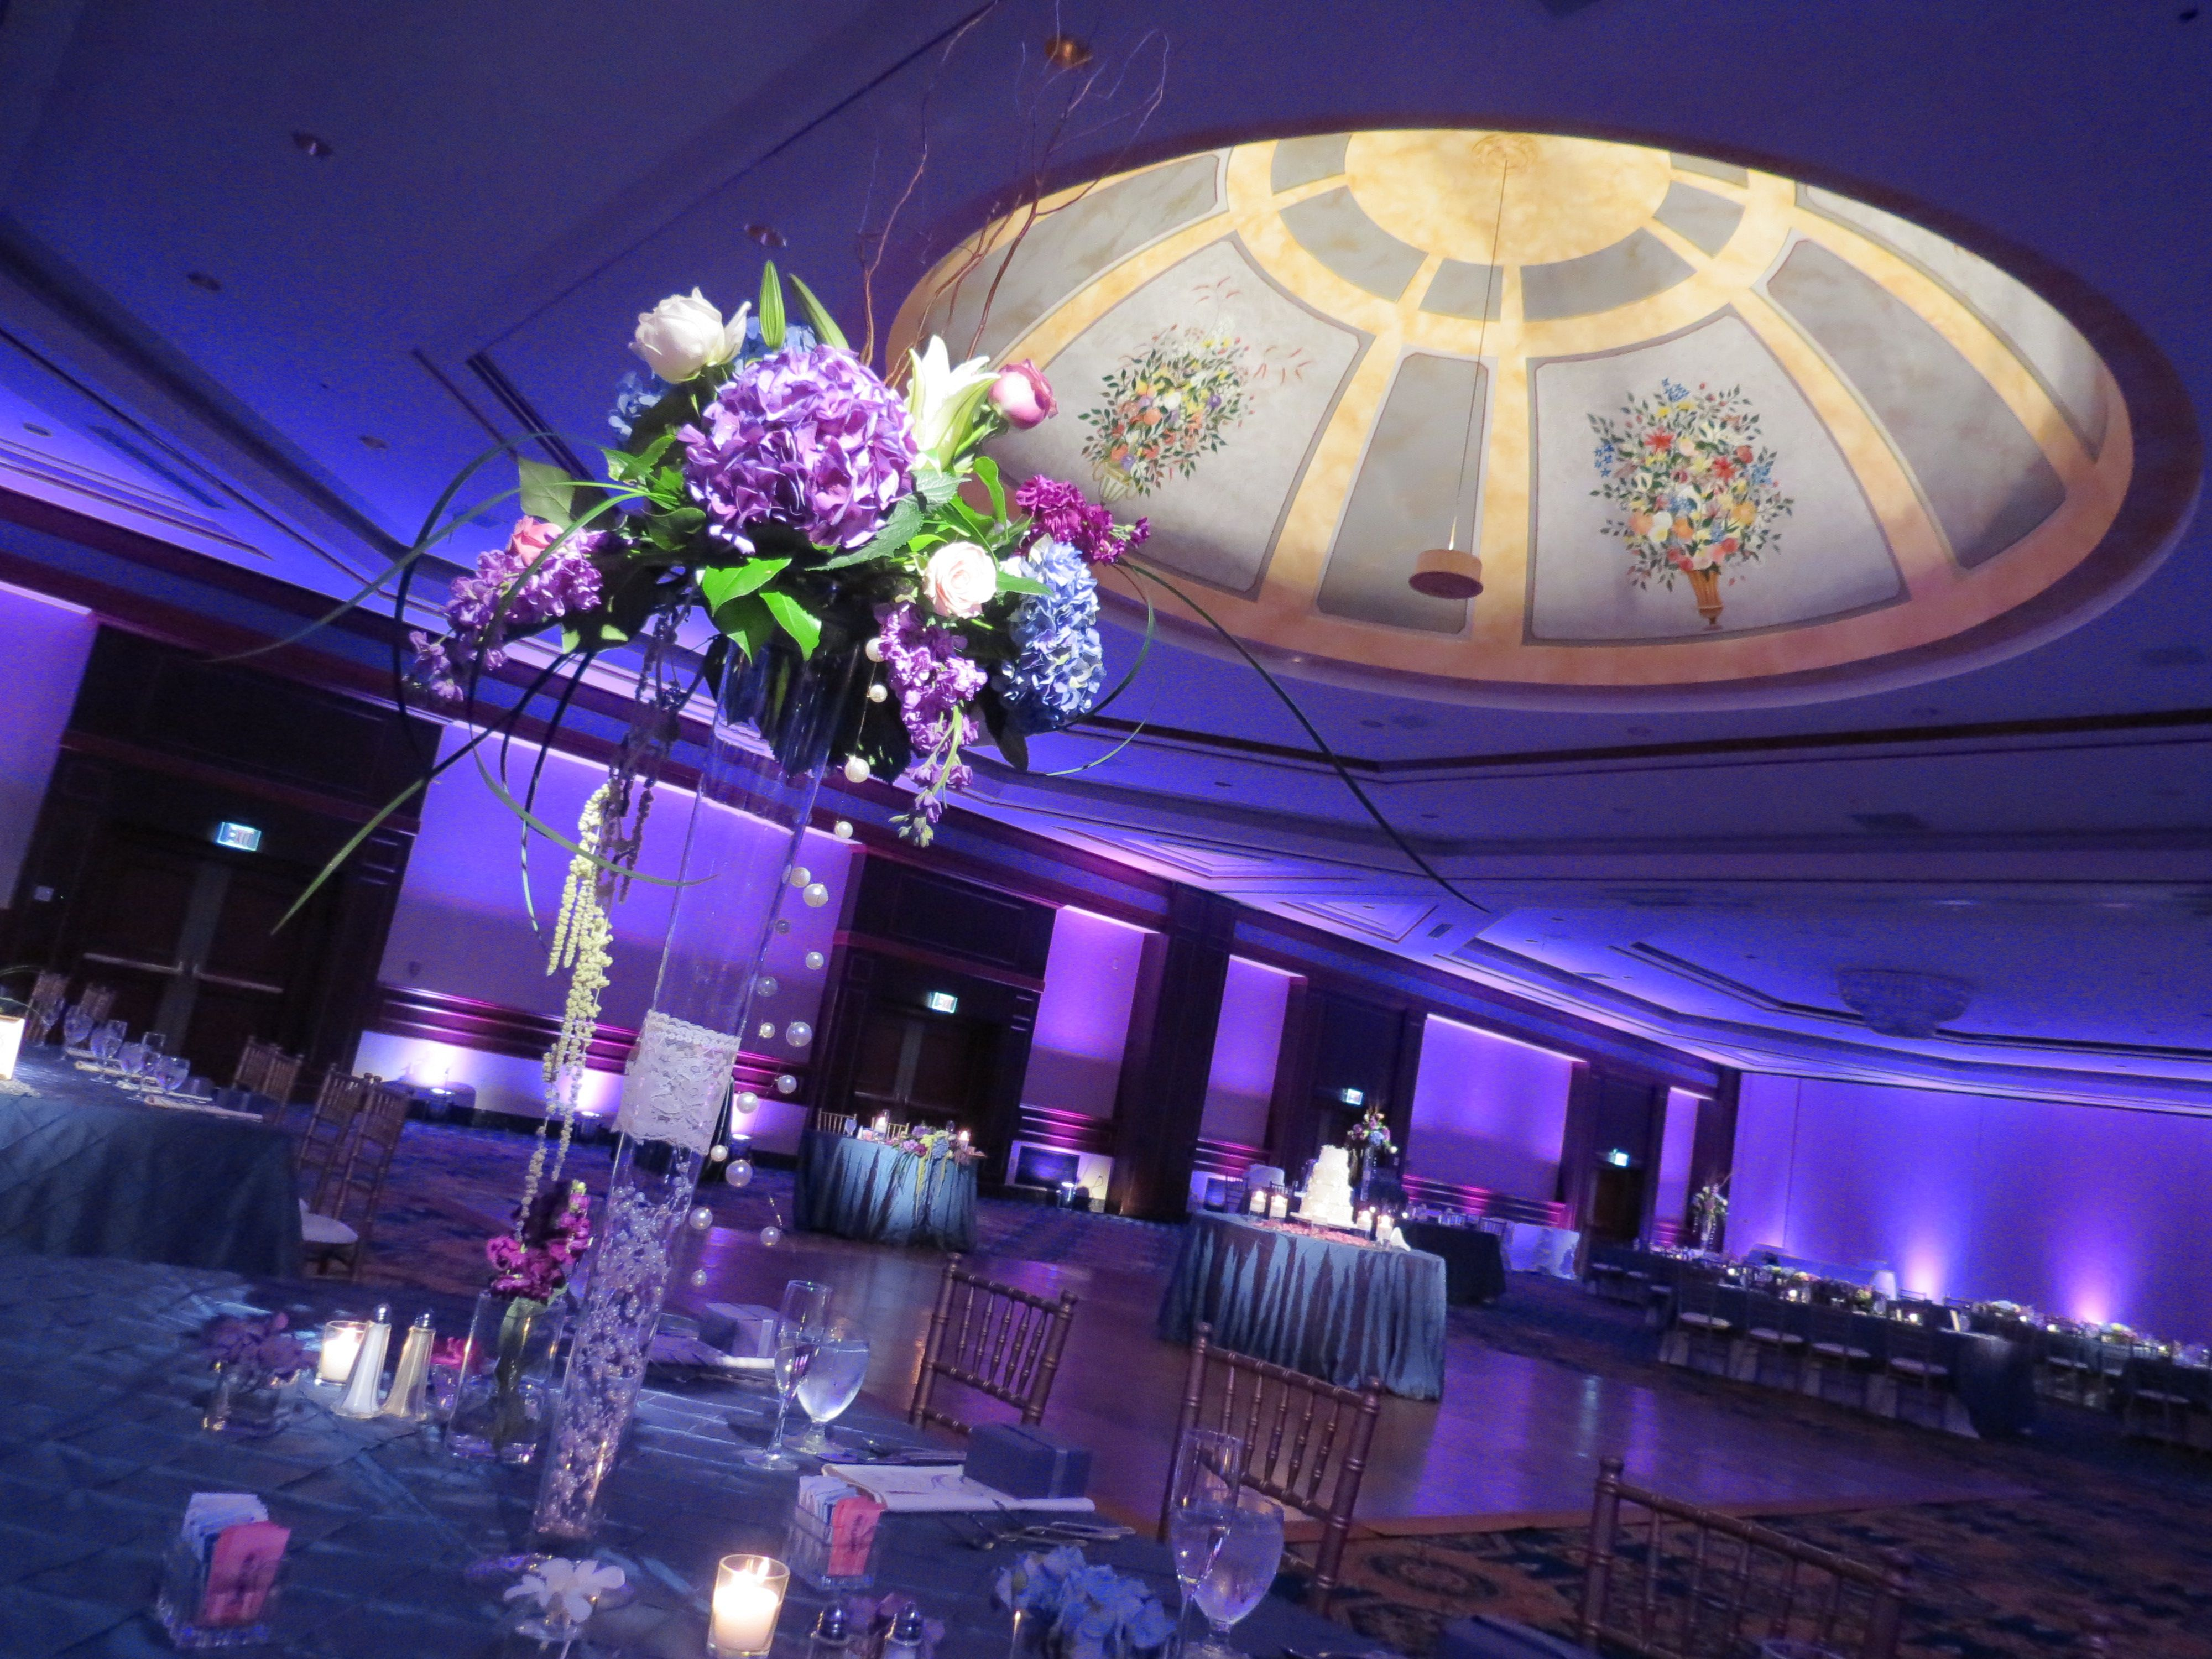 wedding reception crowne plazspringfield il%0A wedding reception venues in springfield il Wedding and Event Lighting in Springfield  IL Crowne Plaza